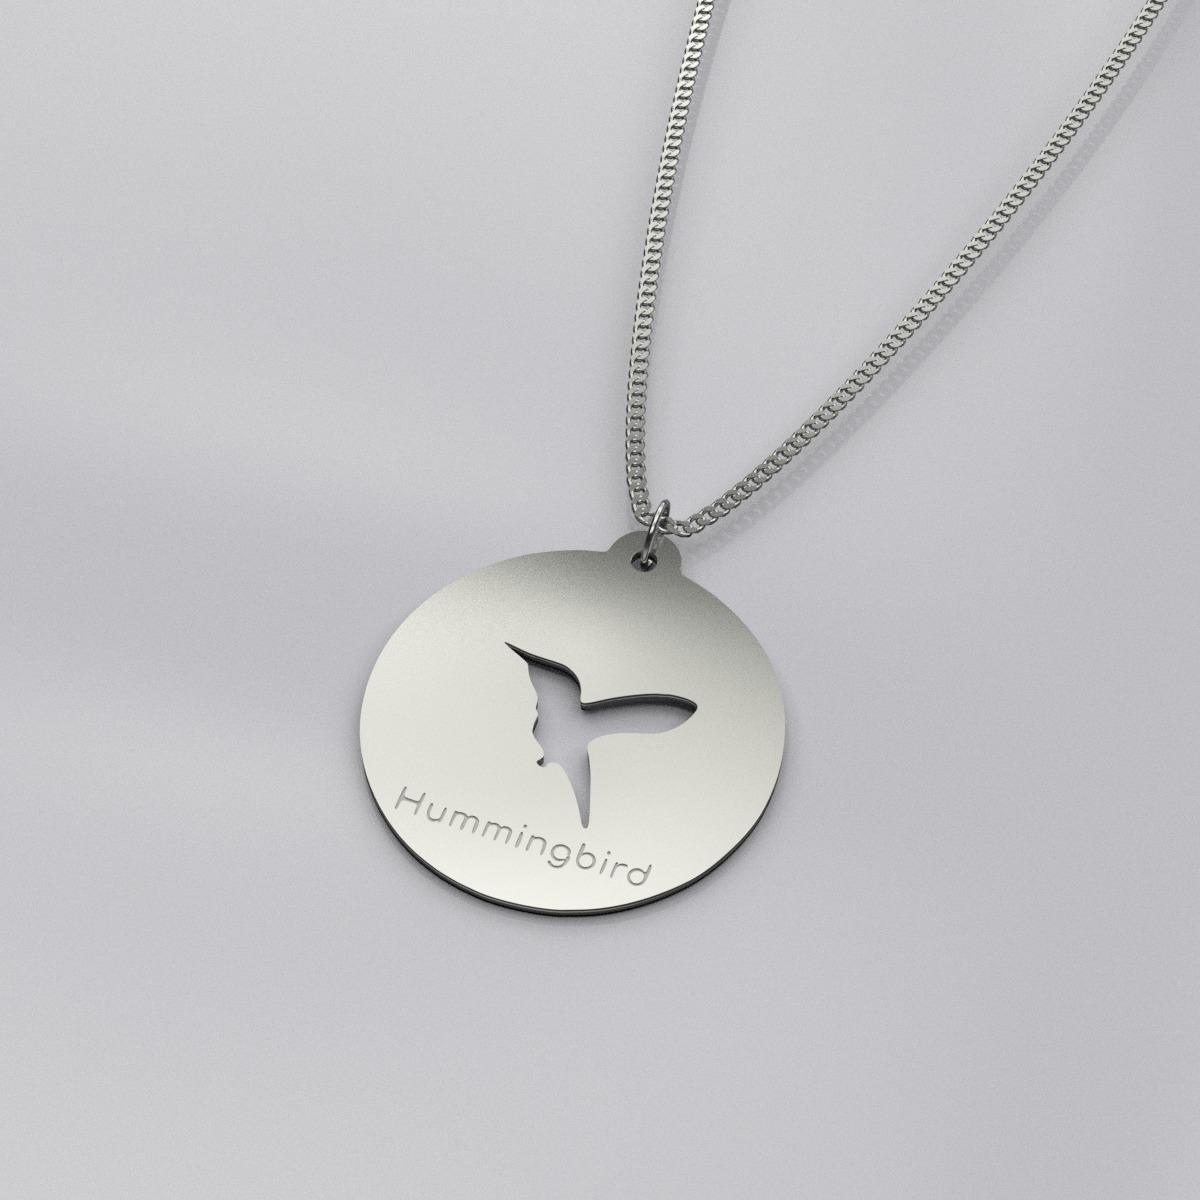 Pendant still silver plated